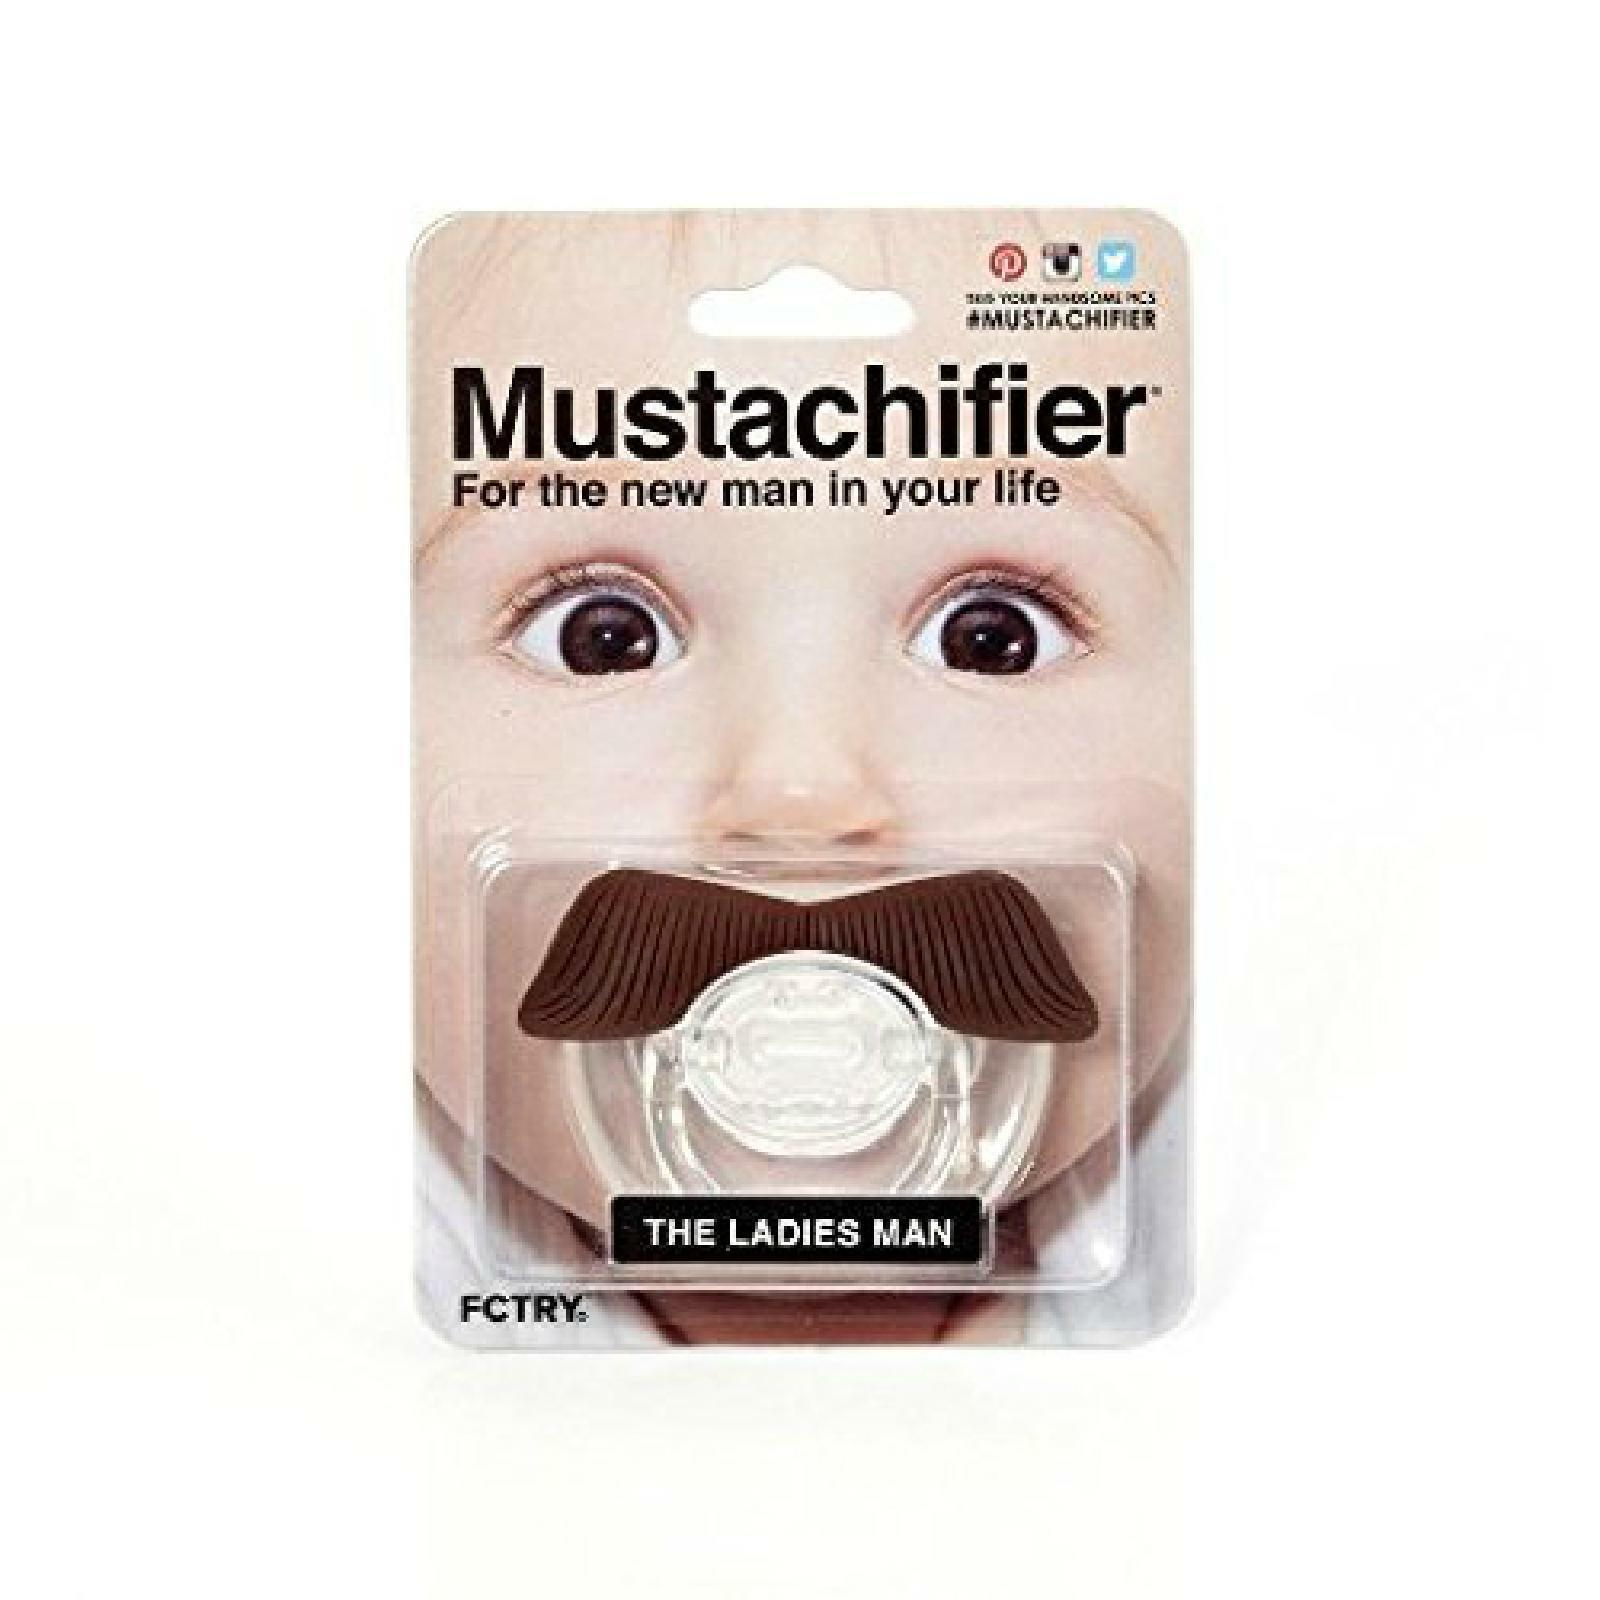 Mustachifier The Ladies Man Baby Mustache Pacifier Binkie Silicone BPA Free